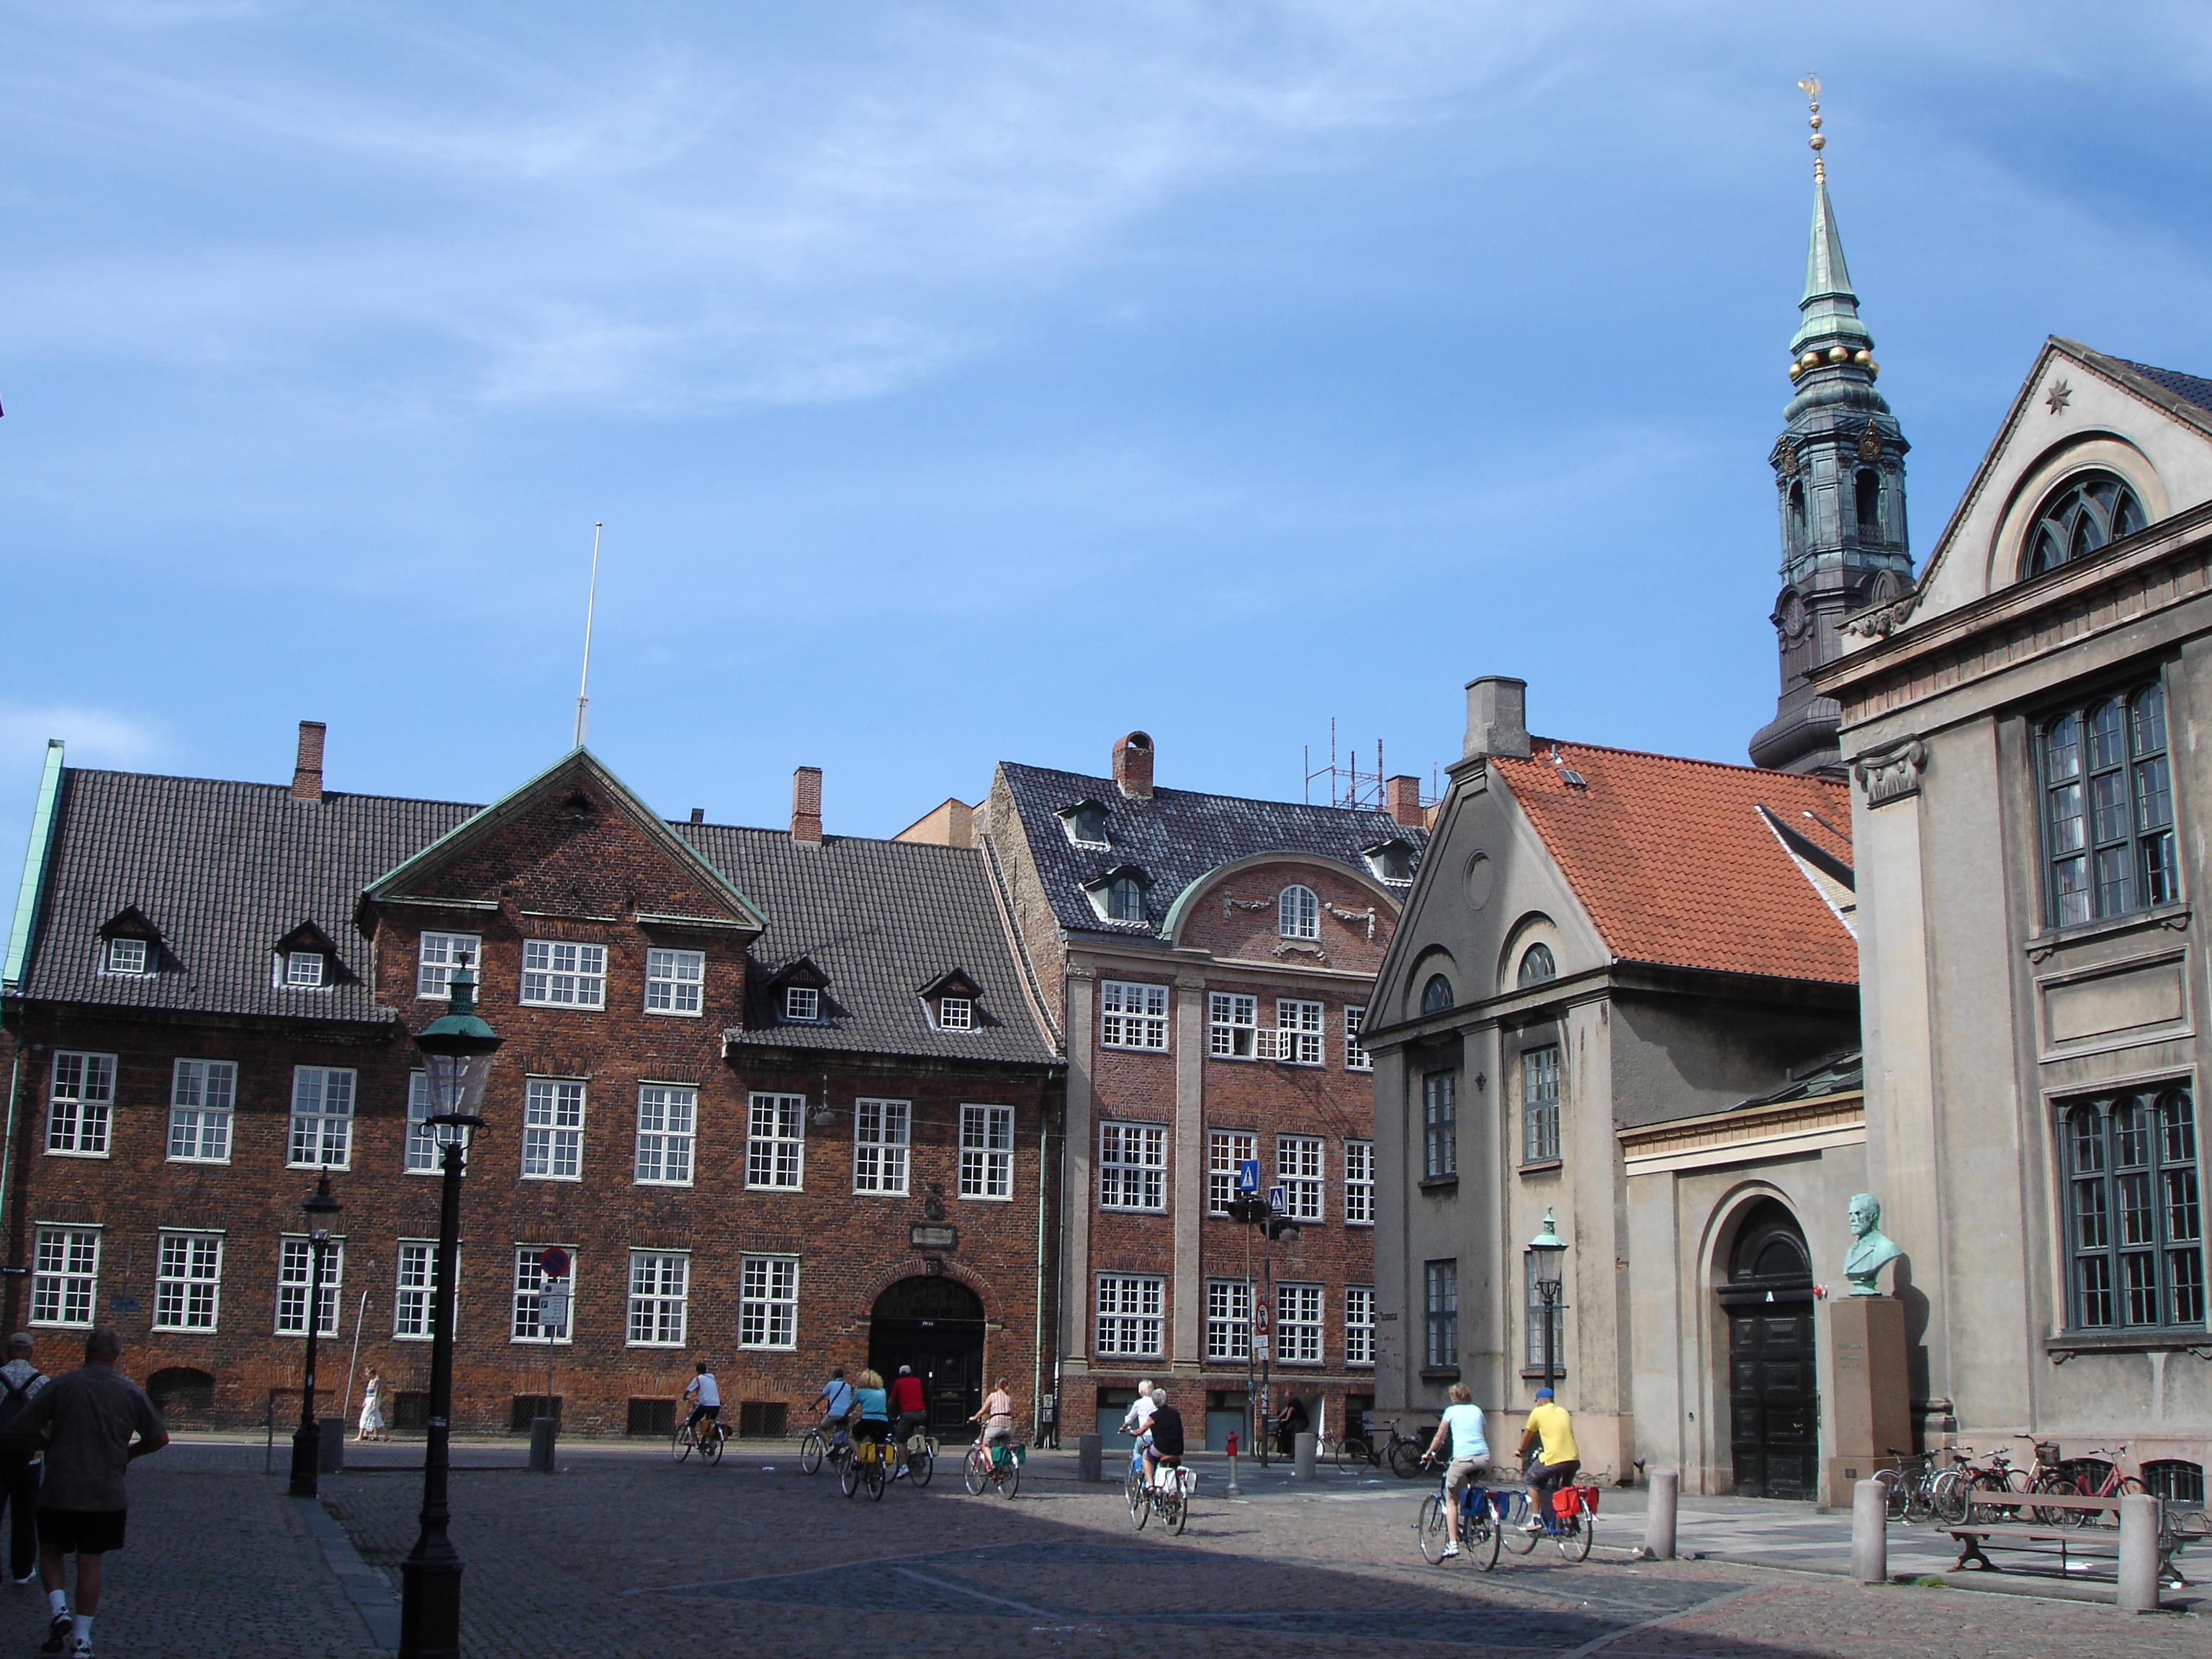 https://upload.wikimedia.org/wikipedia/commons/5/55/Bispeg%C3%A5rden_-_Copenhagen_University.jpg